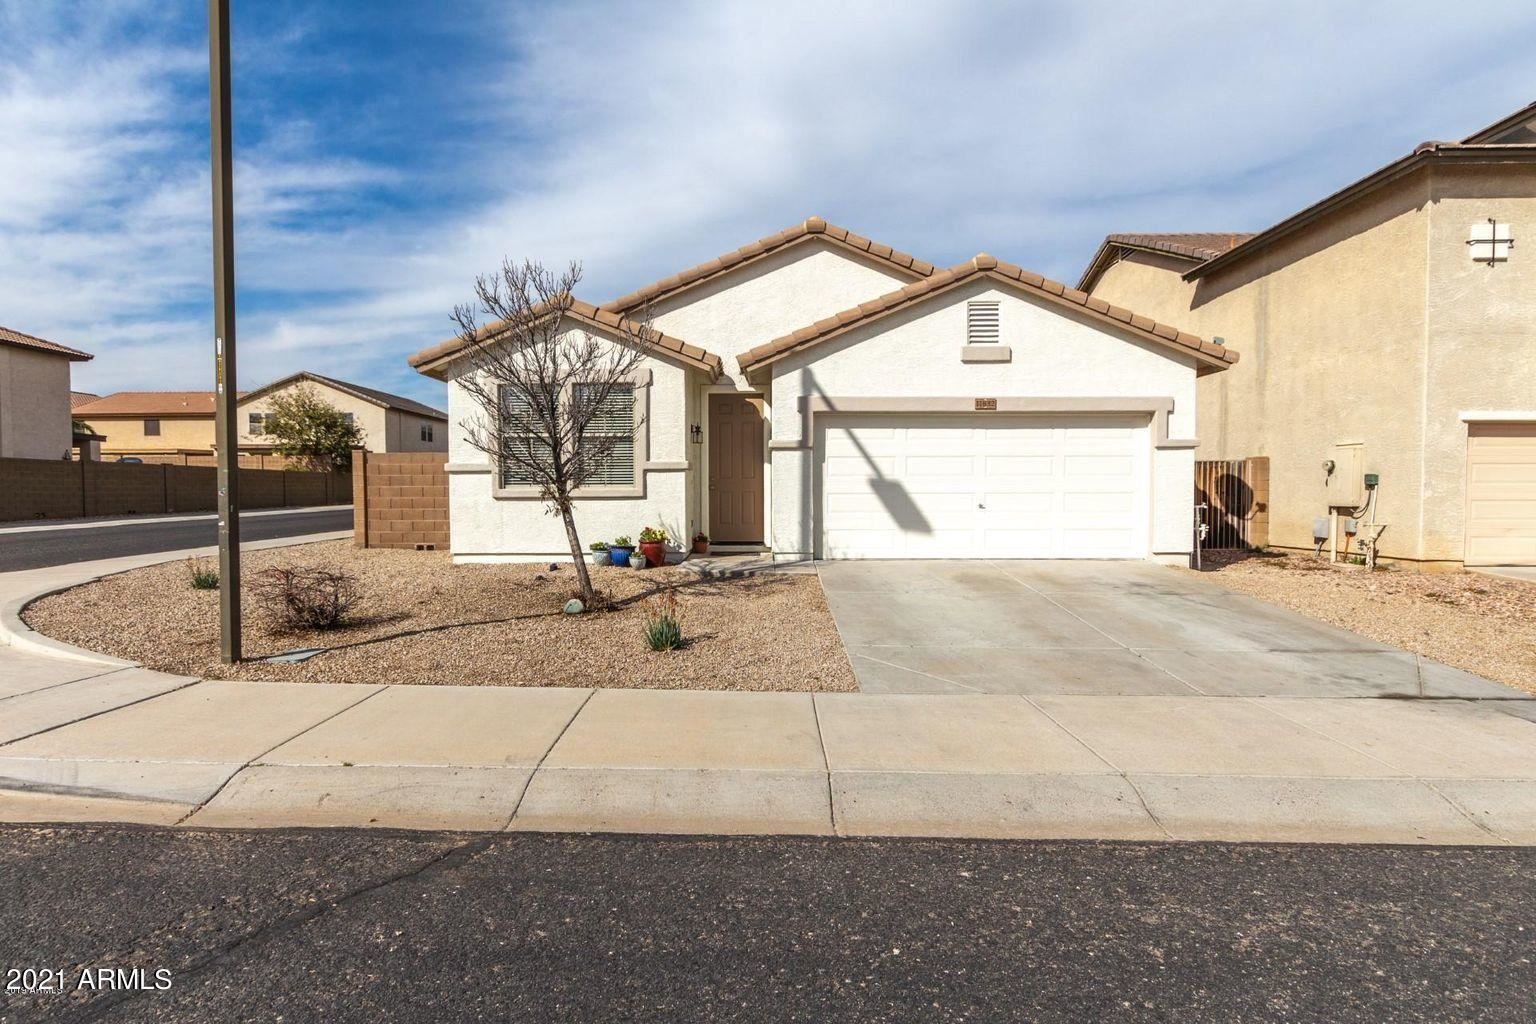 Photo of 11832 W VIA MONTOYA Drive, Sun City, AZ 85373 (MLS # 6197485)